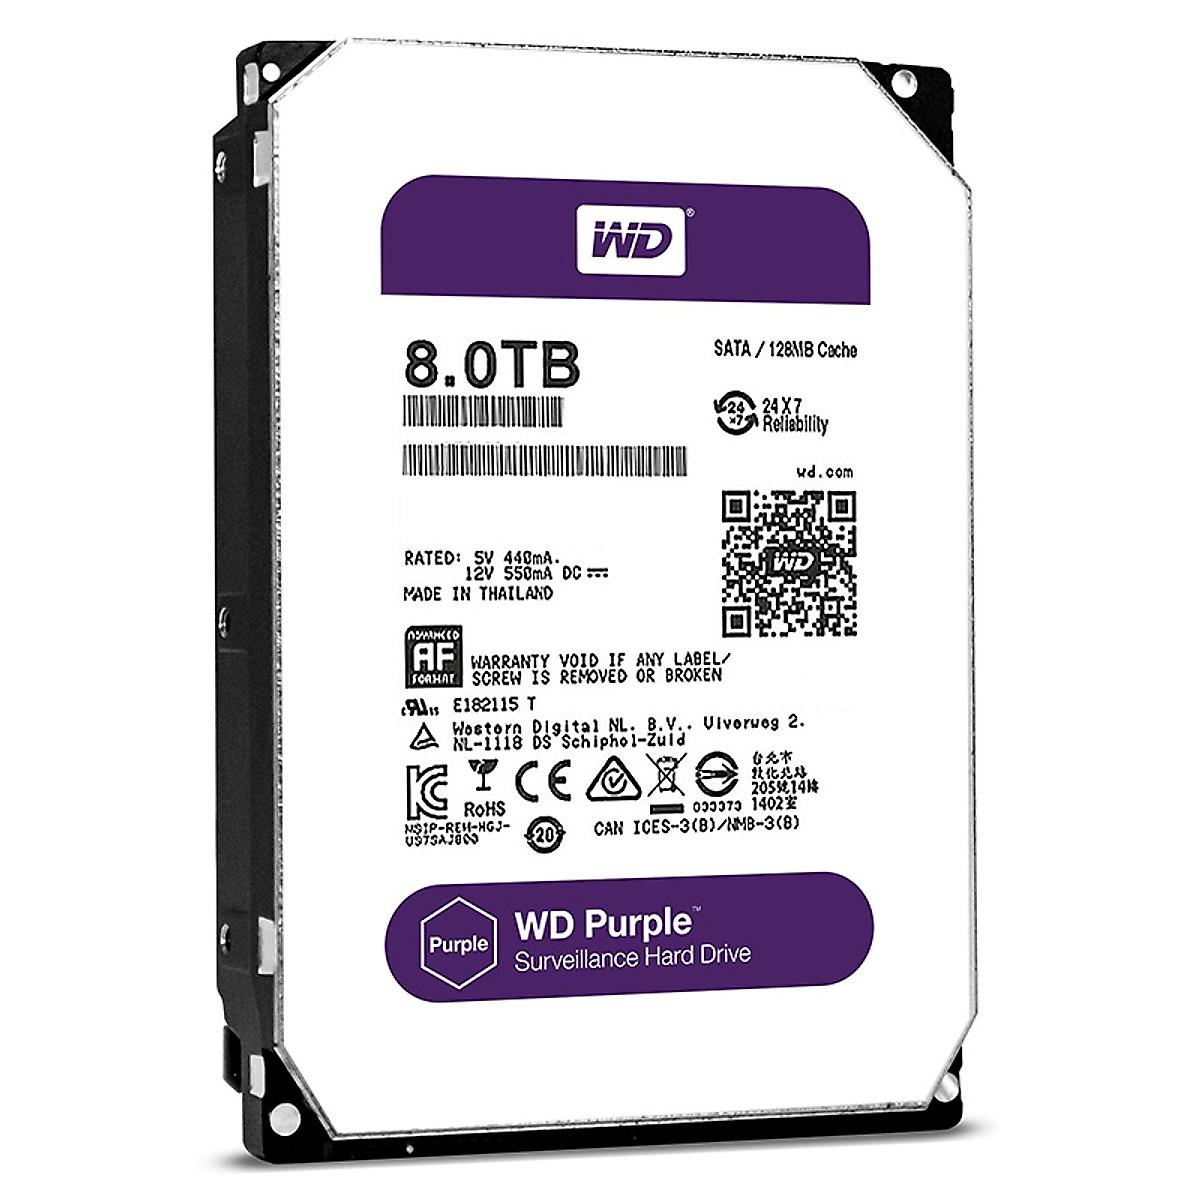 Ổ Cứng HDD Western Digital Purple 8TB 3.5 inch Sata 3 – Hàng Nhập Khẩu